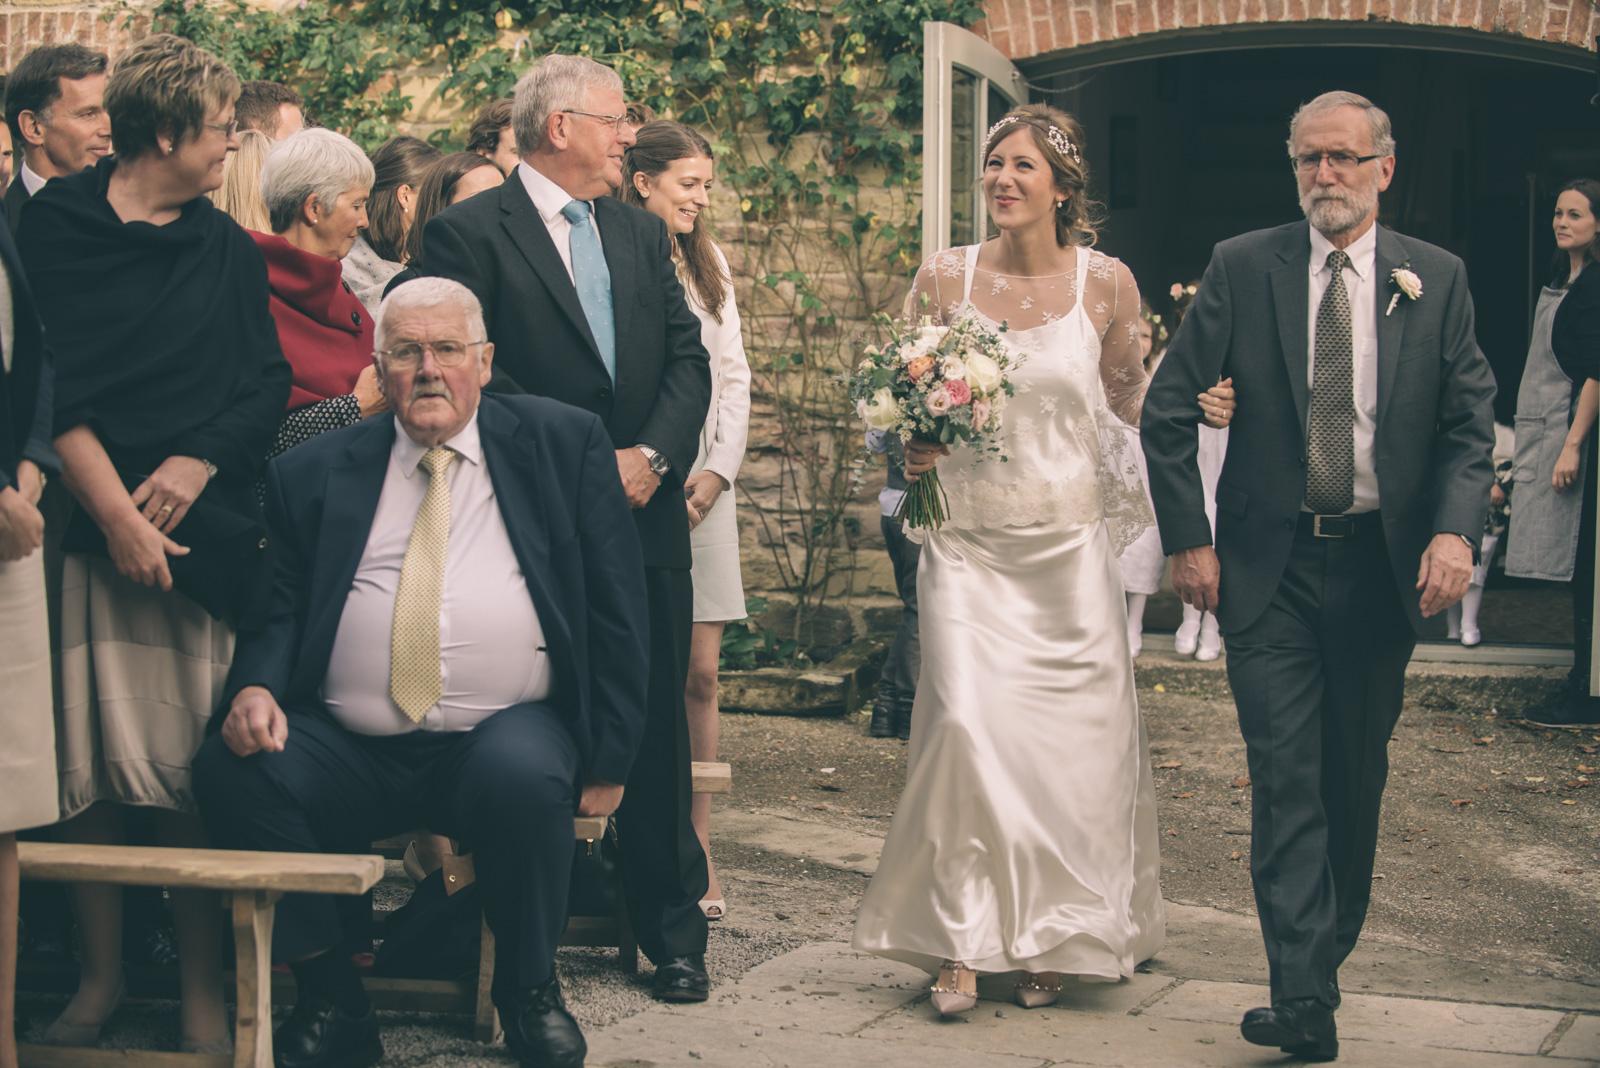 nancarrow-wedding-photography-37.jpg